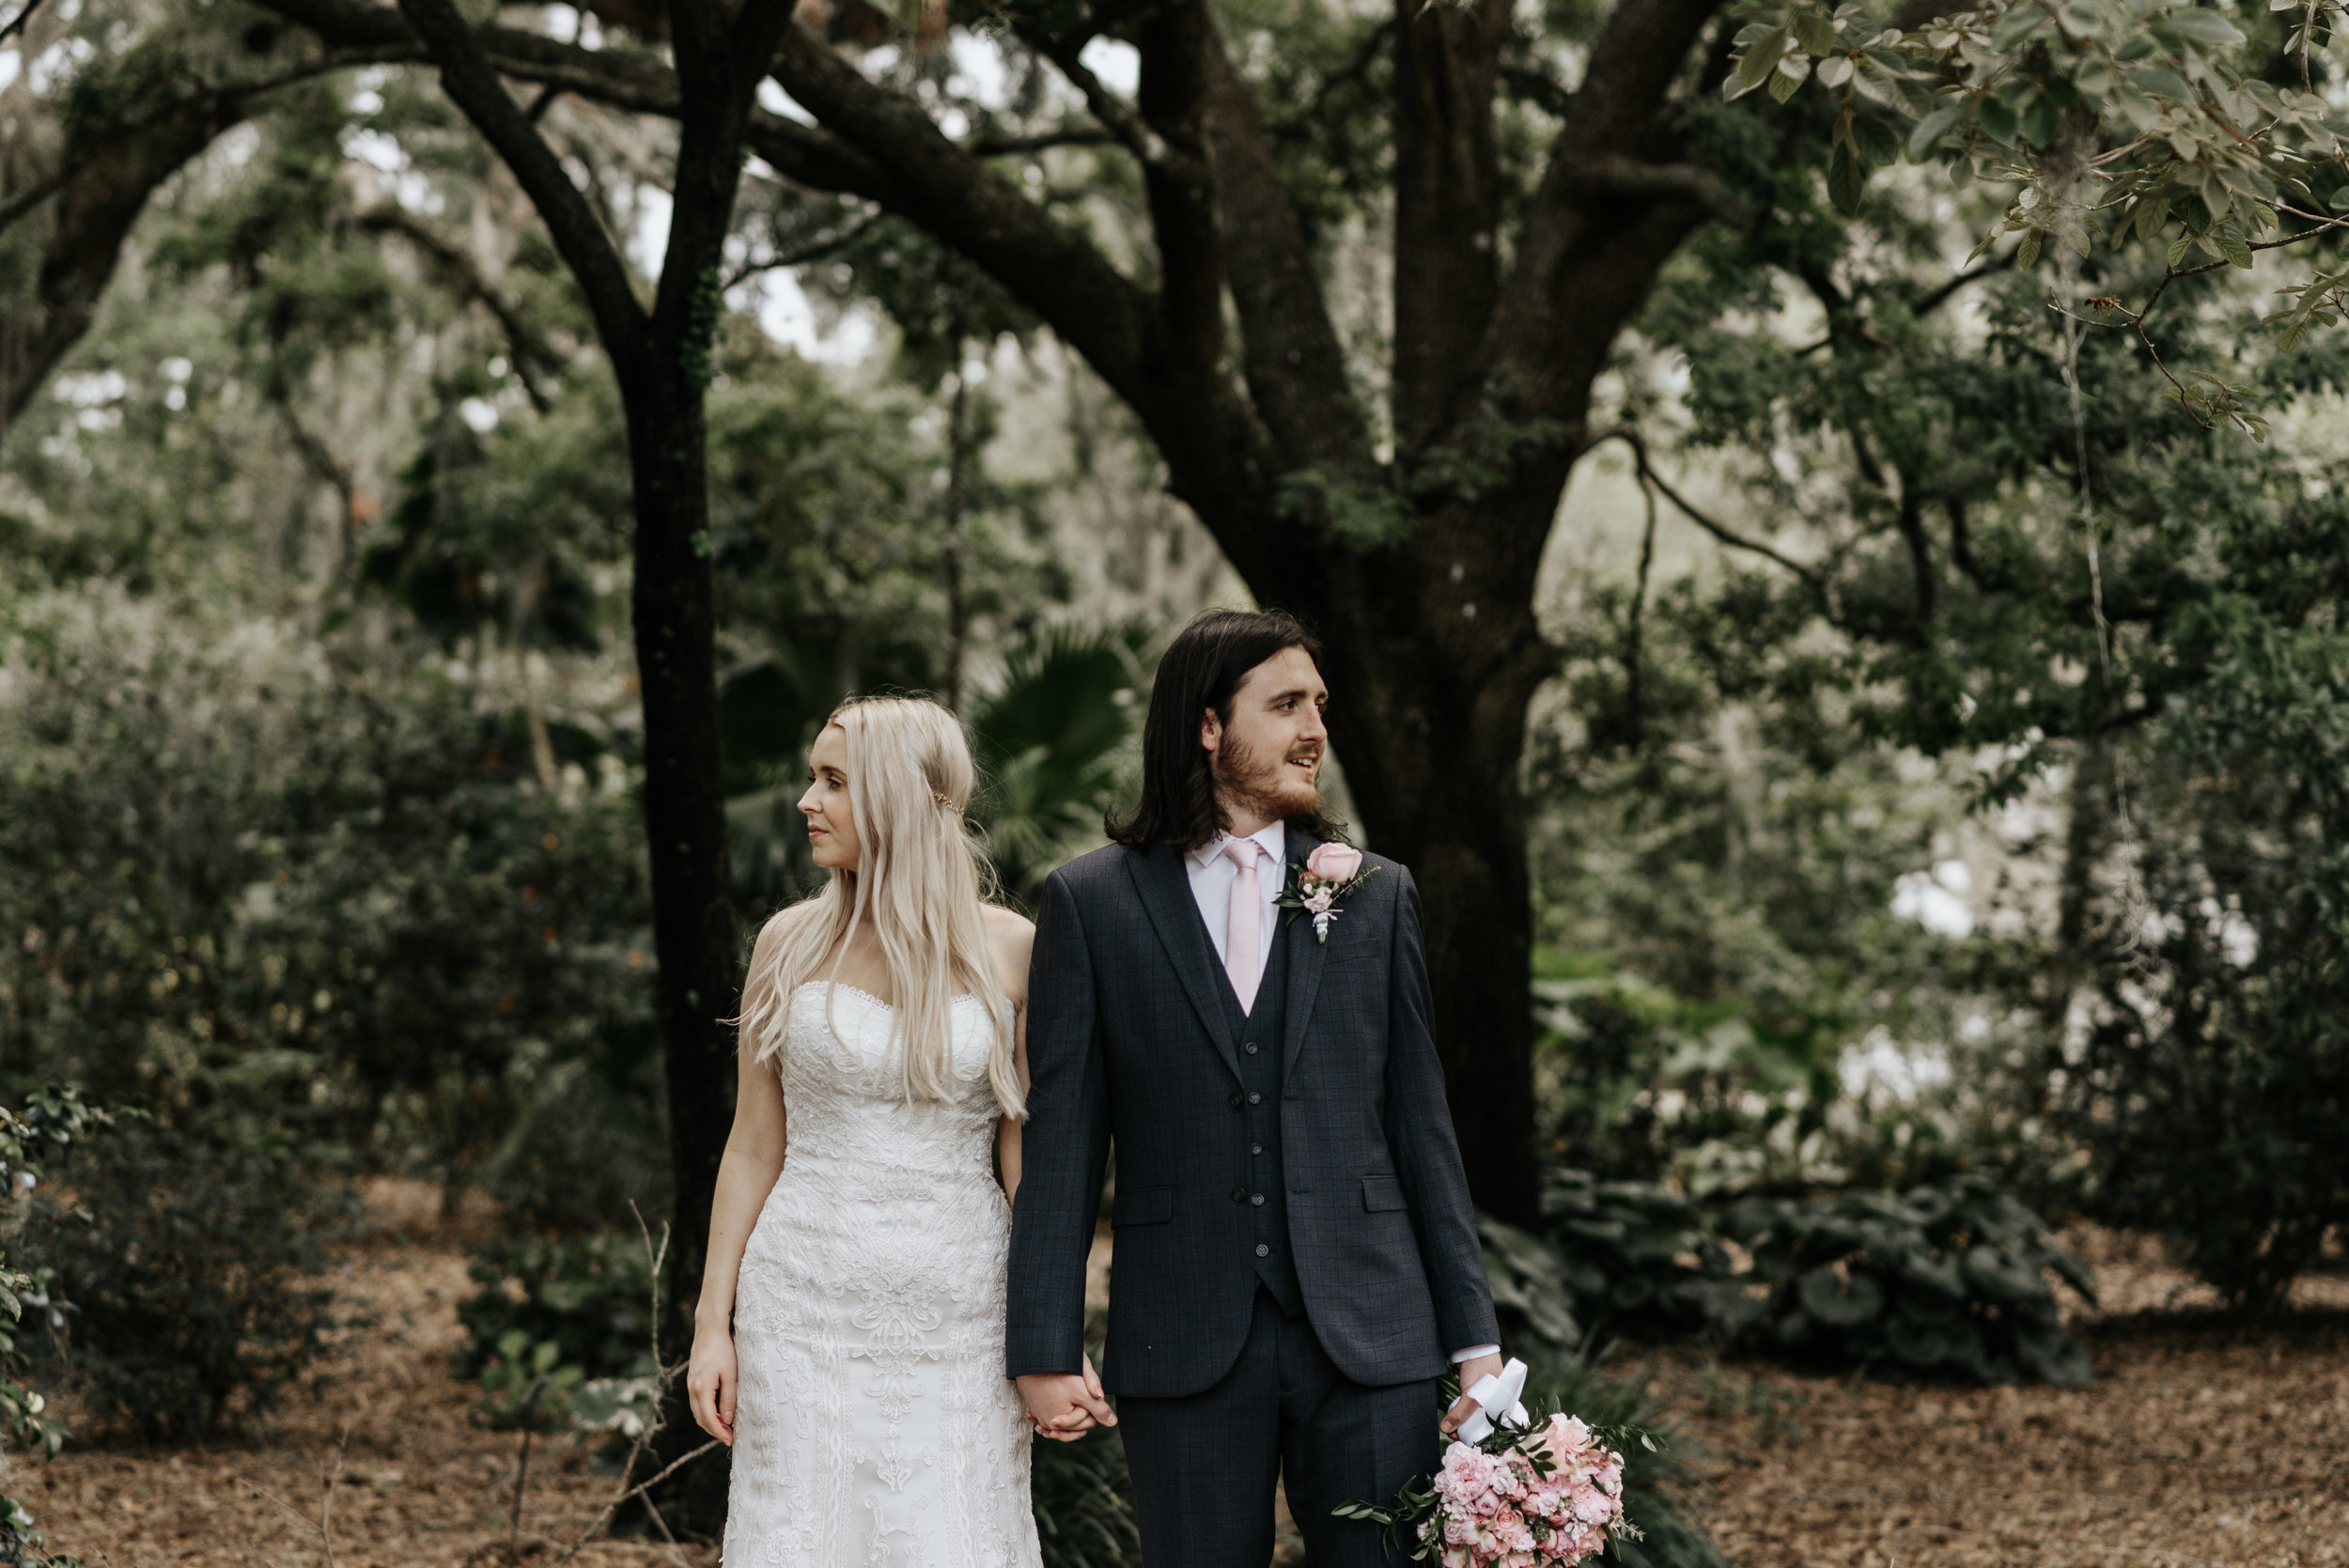 Lora-Richard-Wedding-1354.jpg